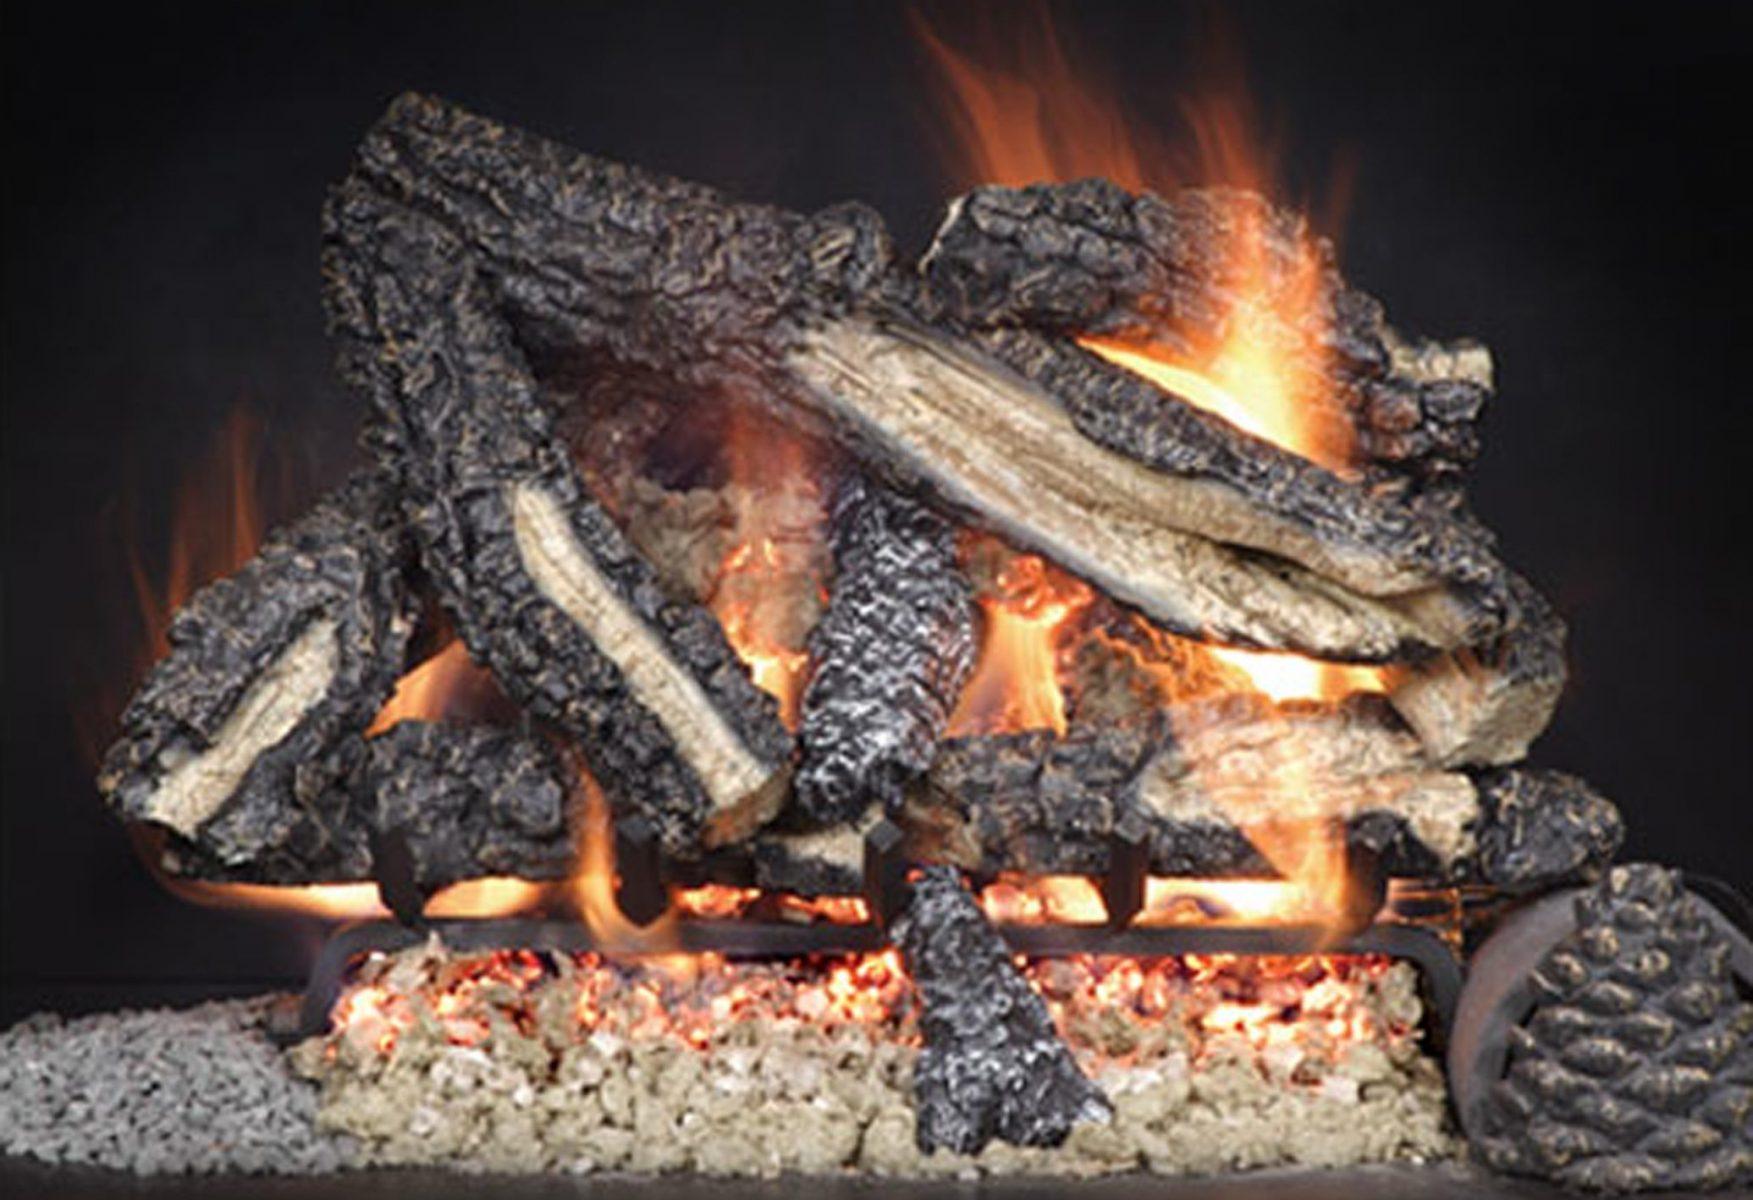 CampfireVentedGasLogSet  Scotts Fireplace Products